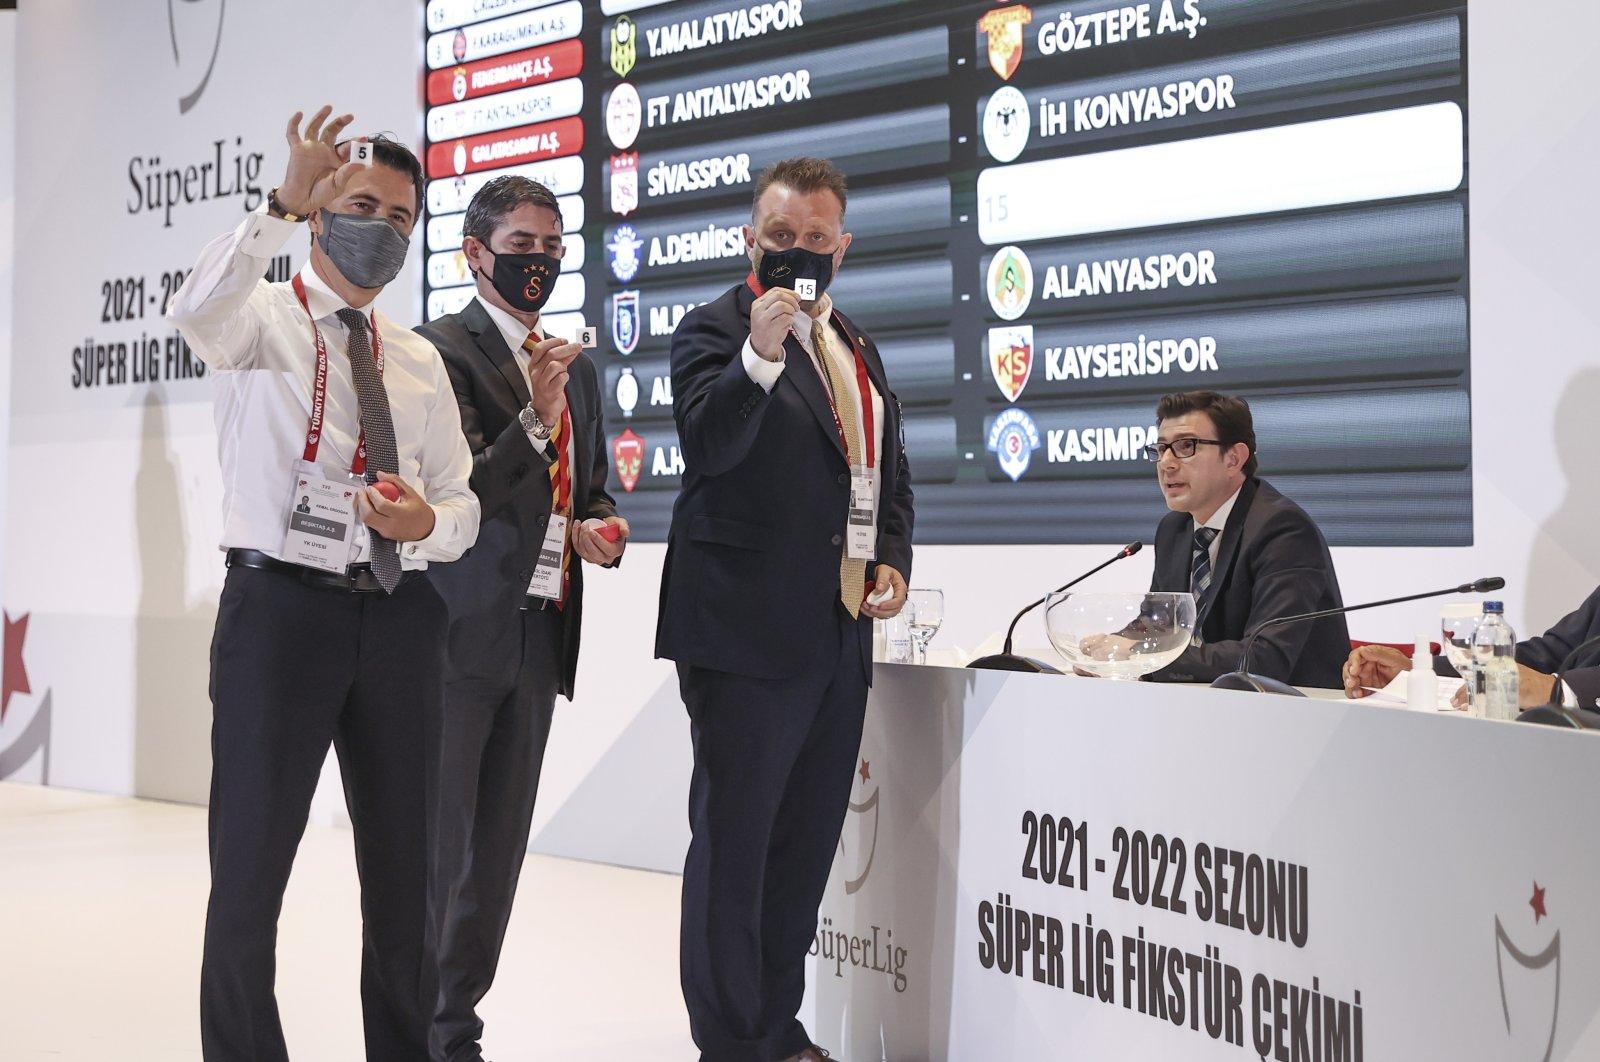 Fenerbahçe managing committee memberSelahattin Baki (L),Galatasaray'sŞükrü Haneda (2nd L) andBeşiktaş'sKemal Erdoğan attends the fixture draw for the 2021/22 Turkish Süper Lig season at the TFF headquarters at Riva, Istanbul, Turkey, July 13, 2021. (AA Photo)